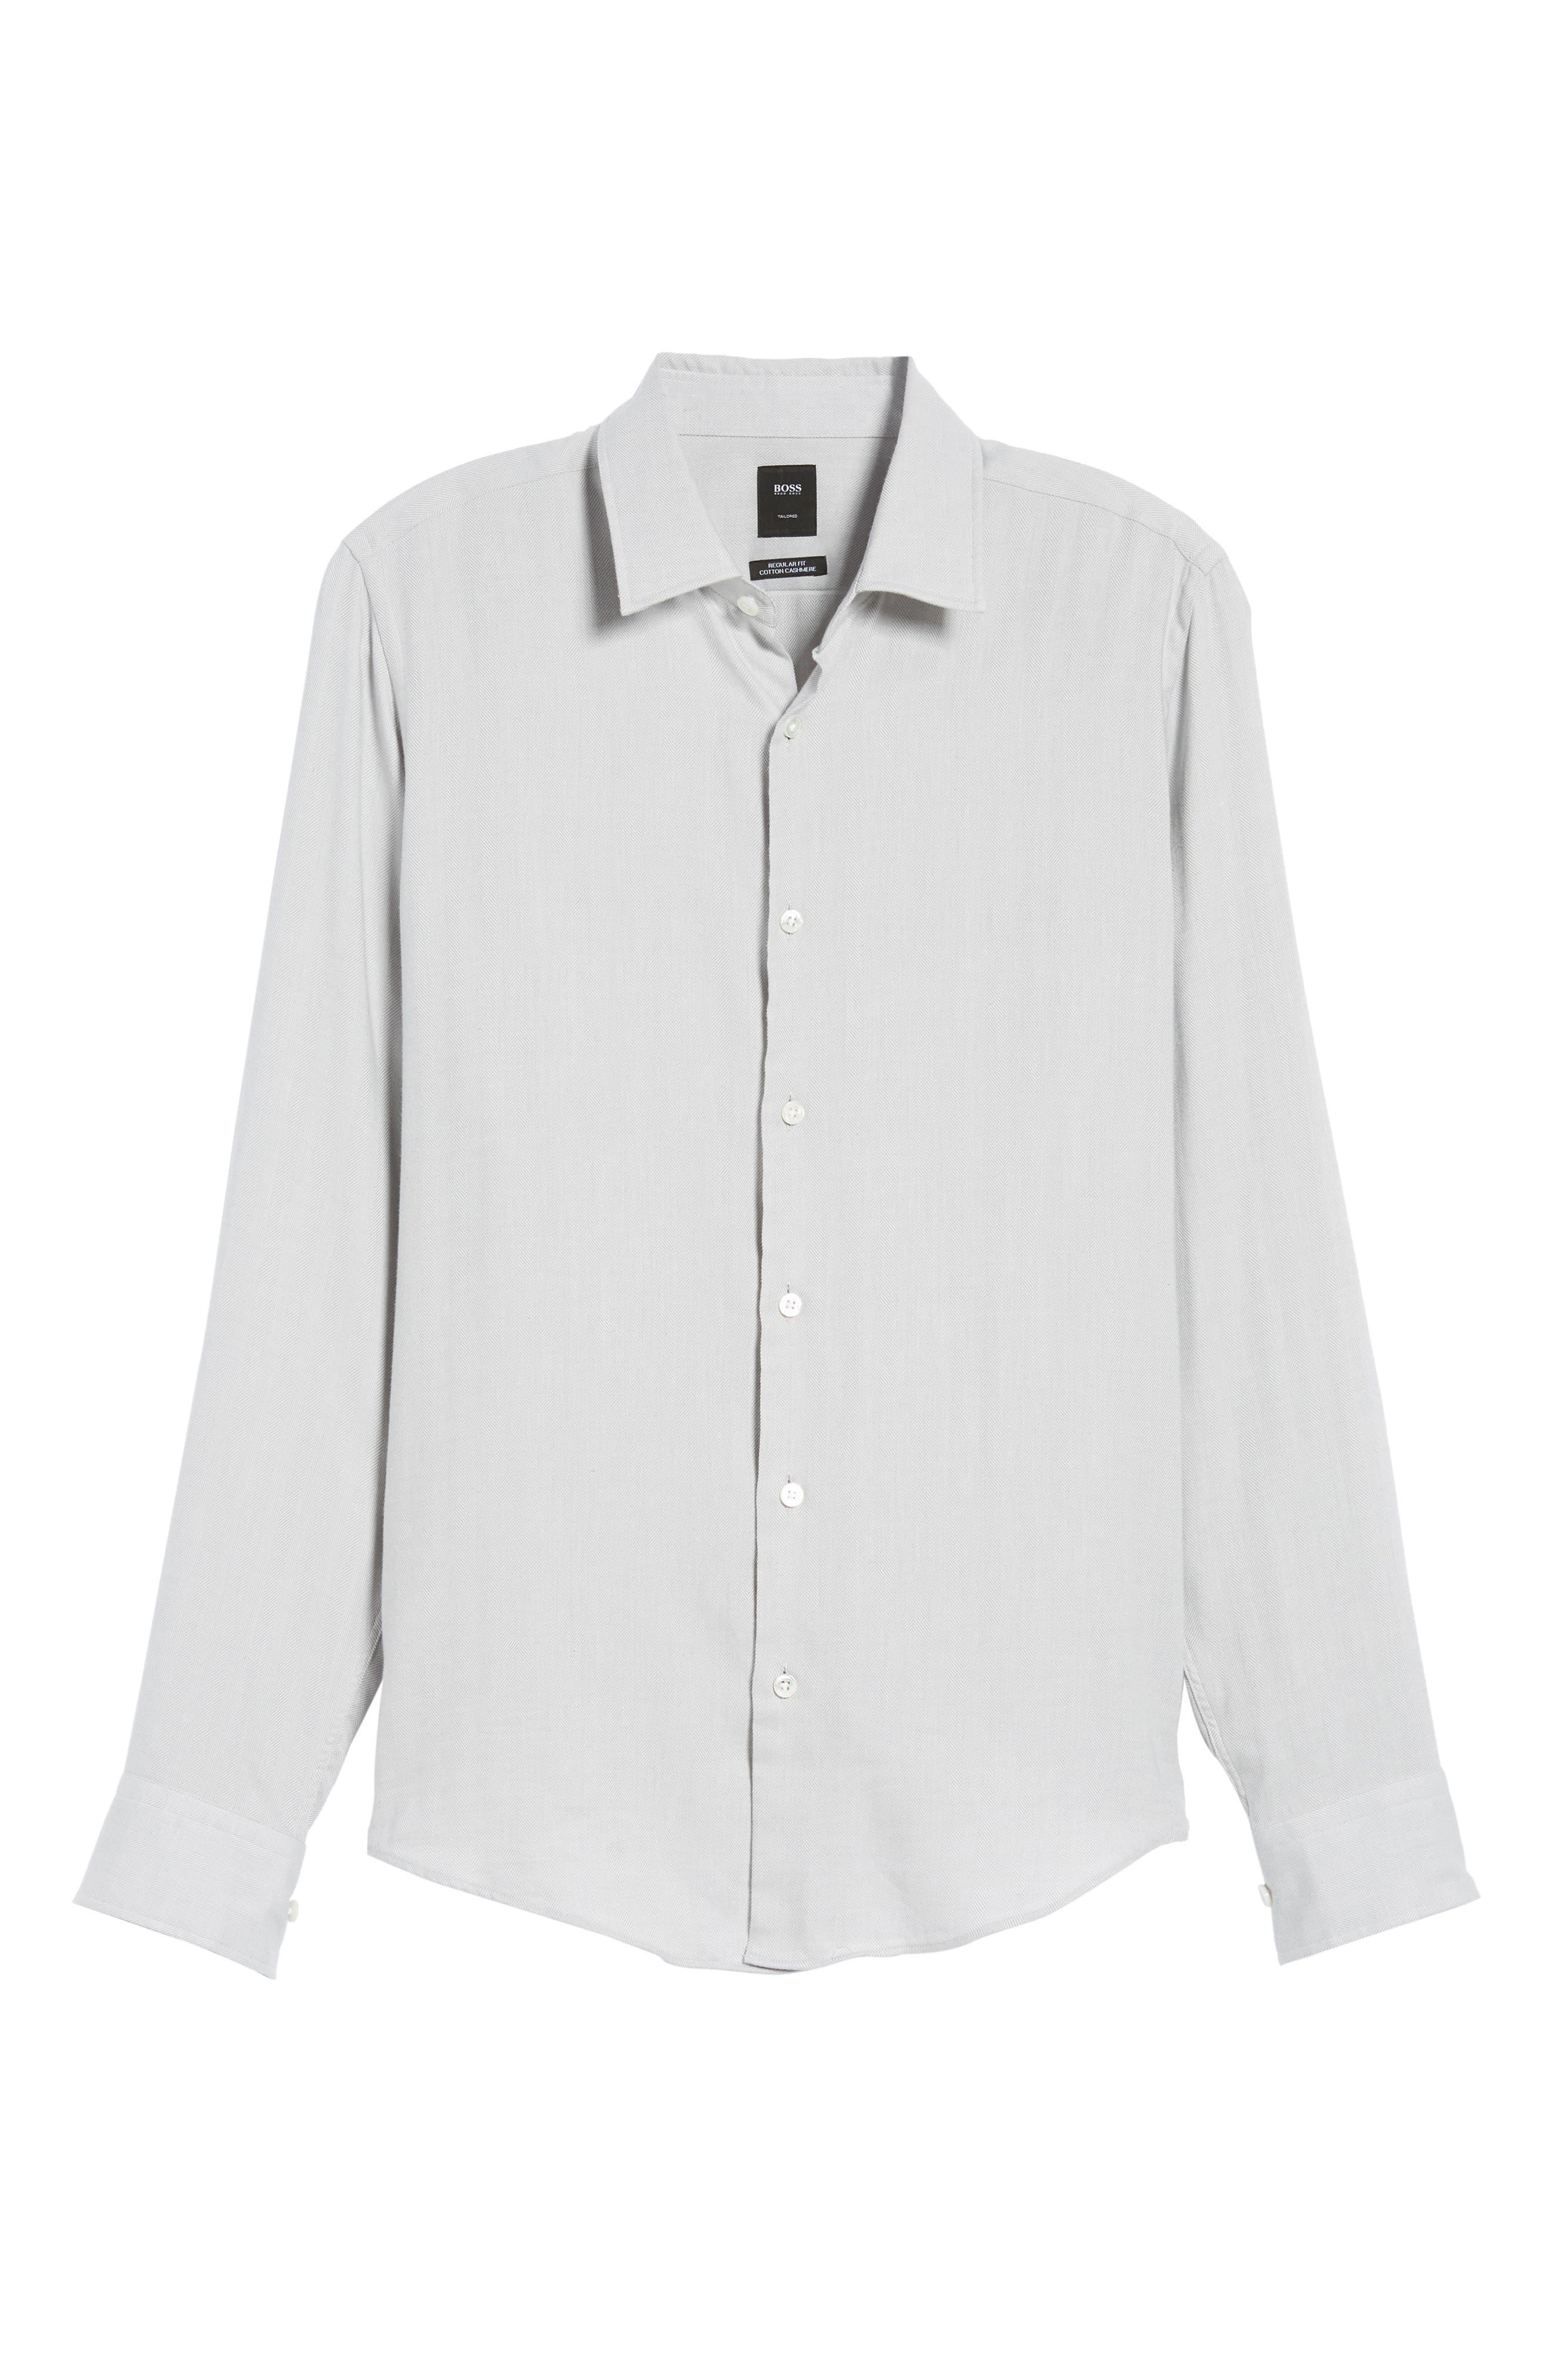 Landon Herringbone Shirt,                             Alternate thumbnail 6, color,